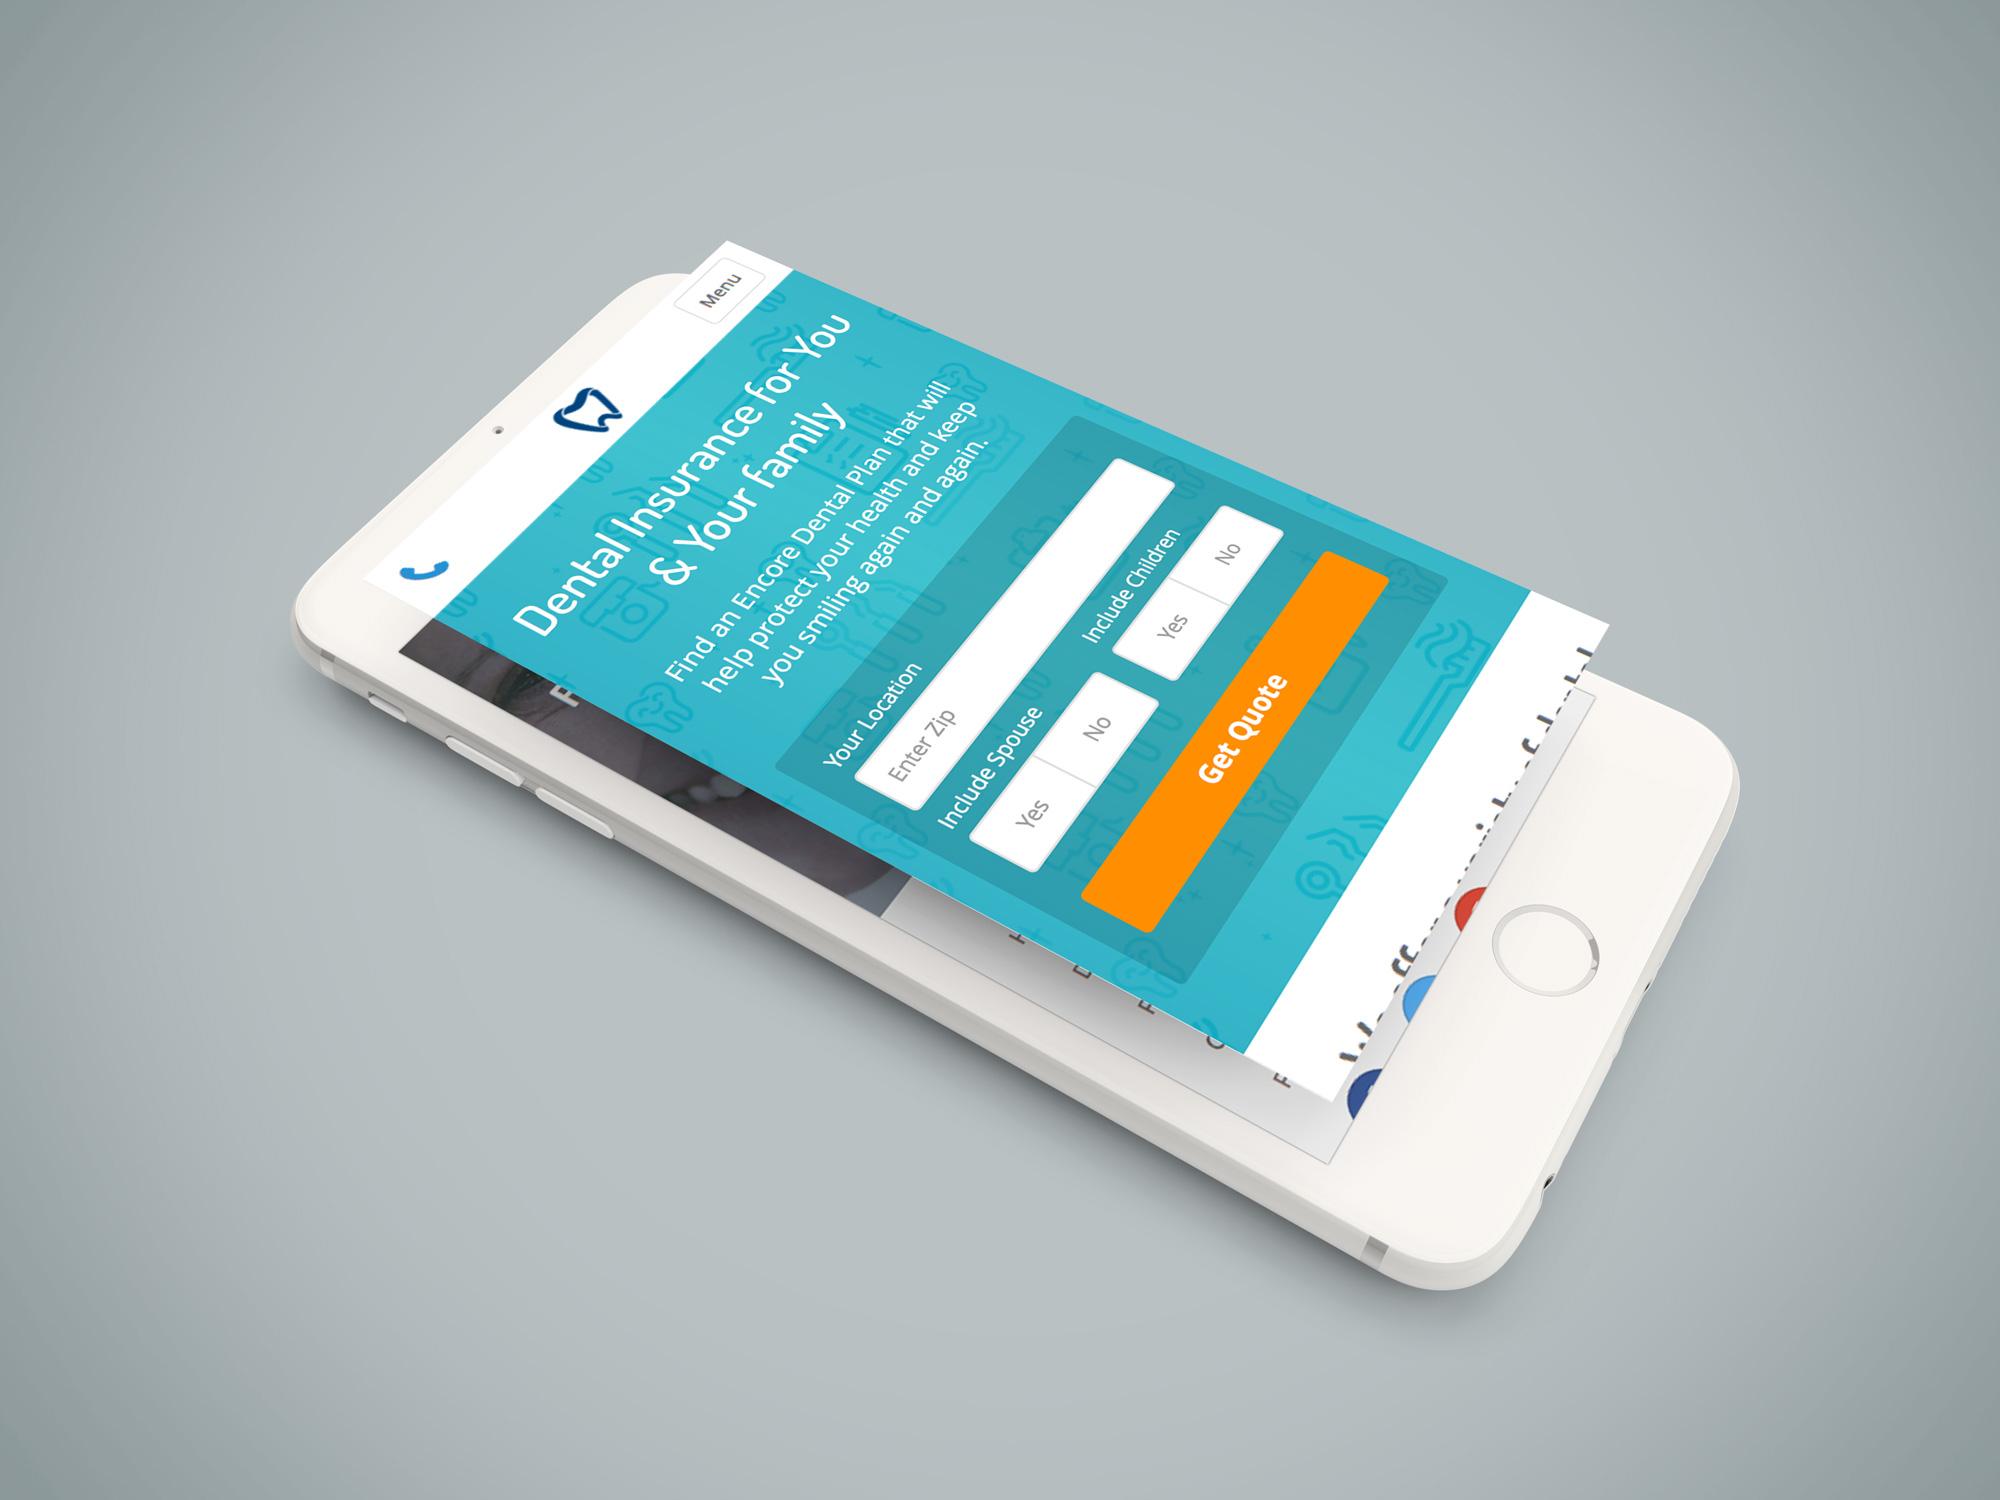 rory-hart-visual-design-iphone6-Carousel.jpg